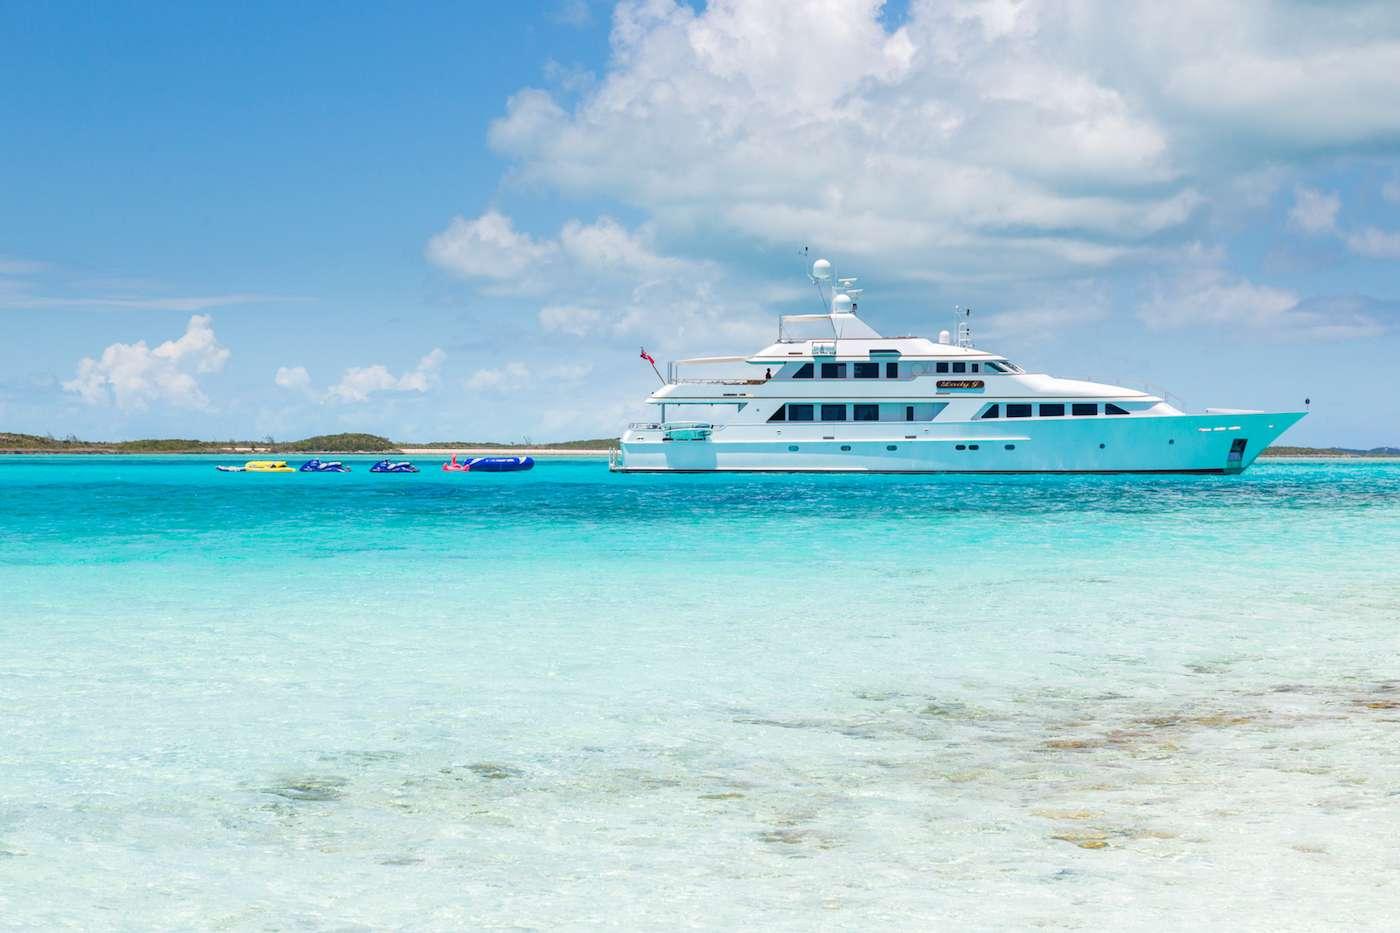 Motor Yacht 'LADY J' Yacht Profile, 12 PAX, 9 Crew, 142.00 Ft, 43.00 Meters, Built 1997, Palmer Johnson, Refit Year 2017